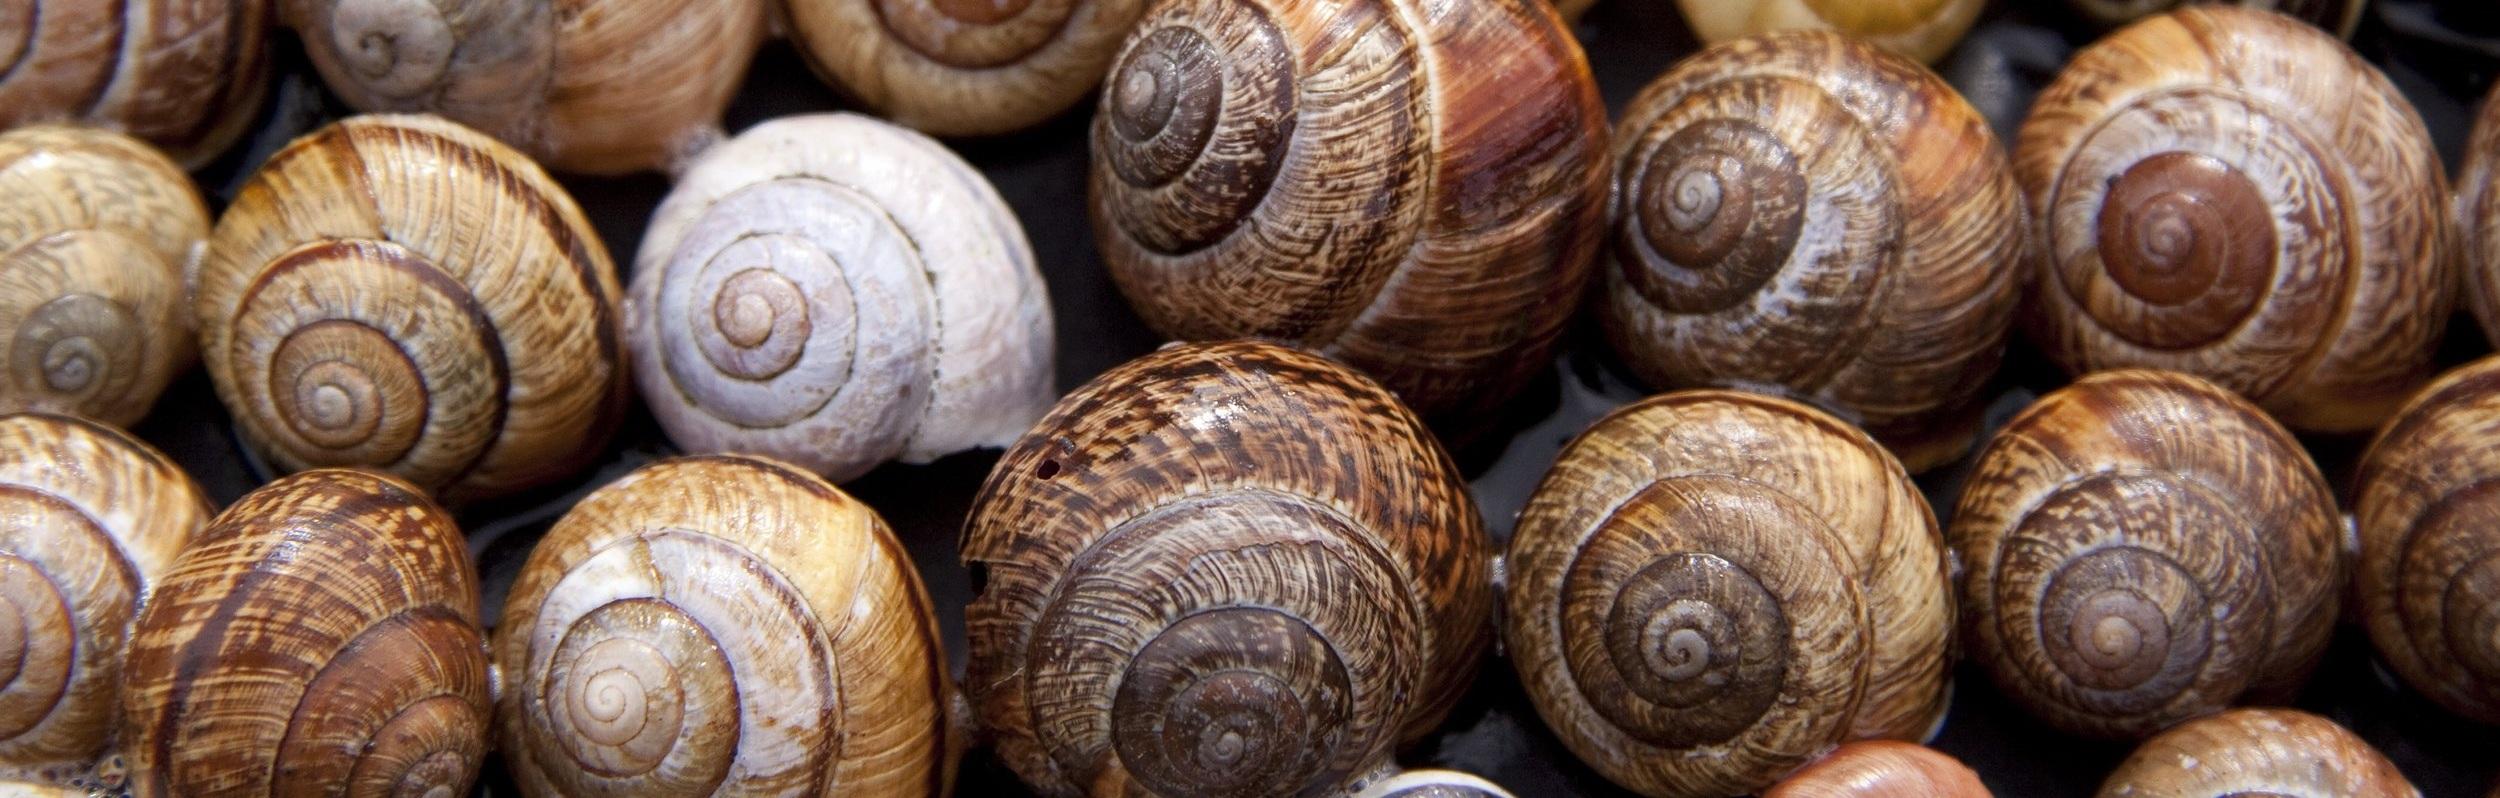 snail+shells.jpg